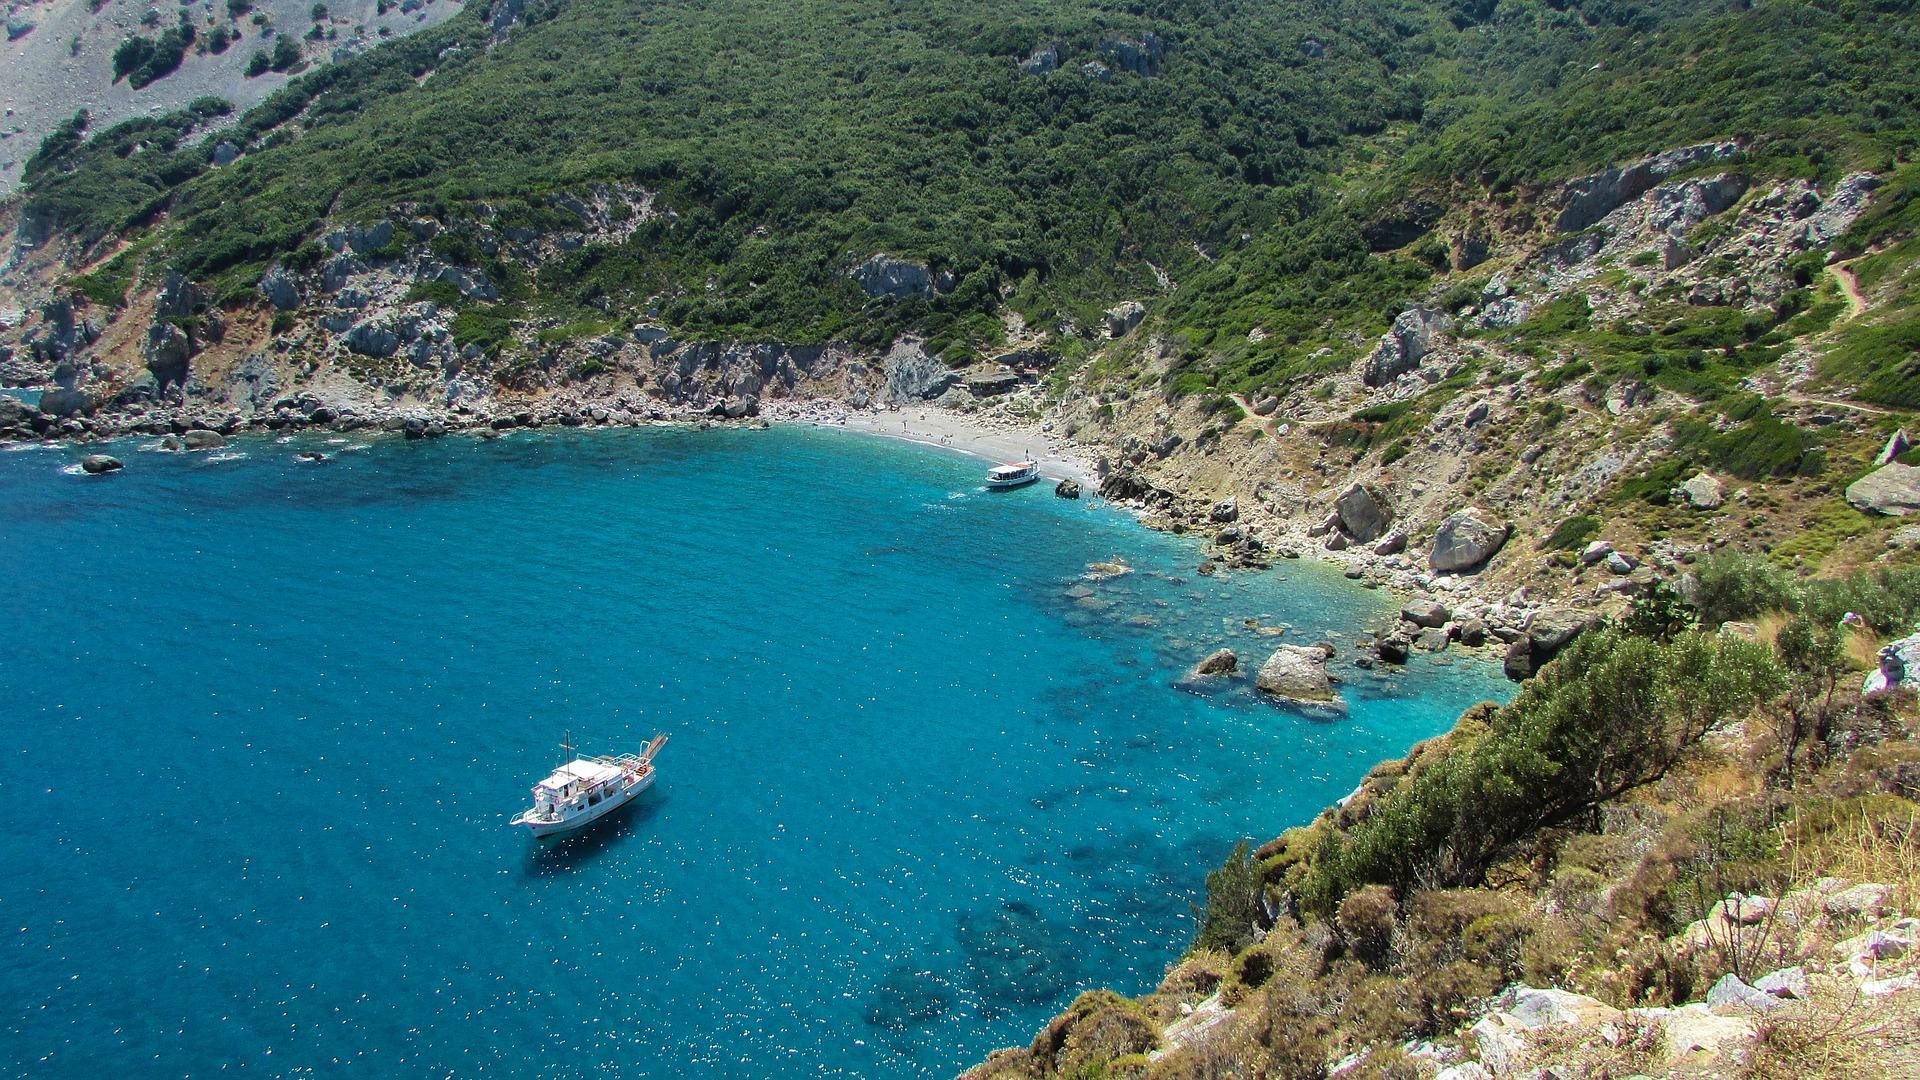 gestion location bateau skiathos - Kiriacoulis France